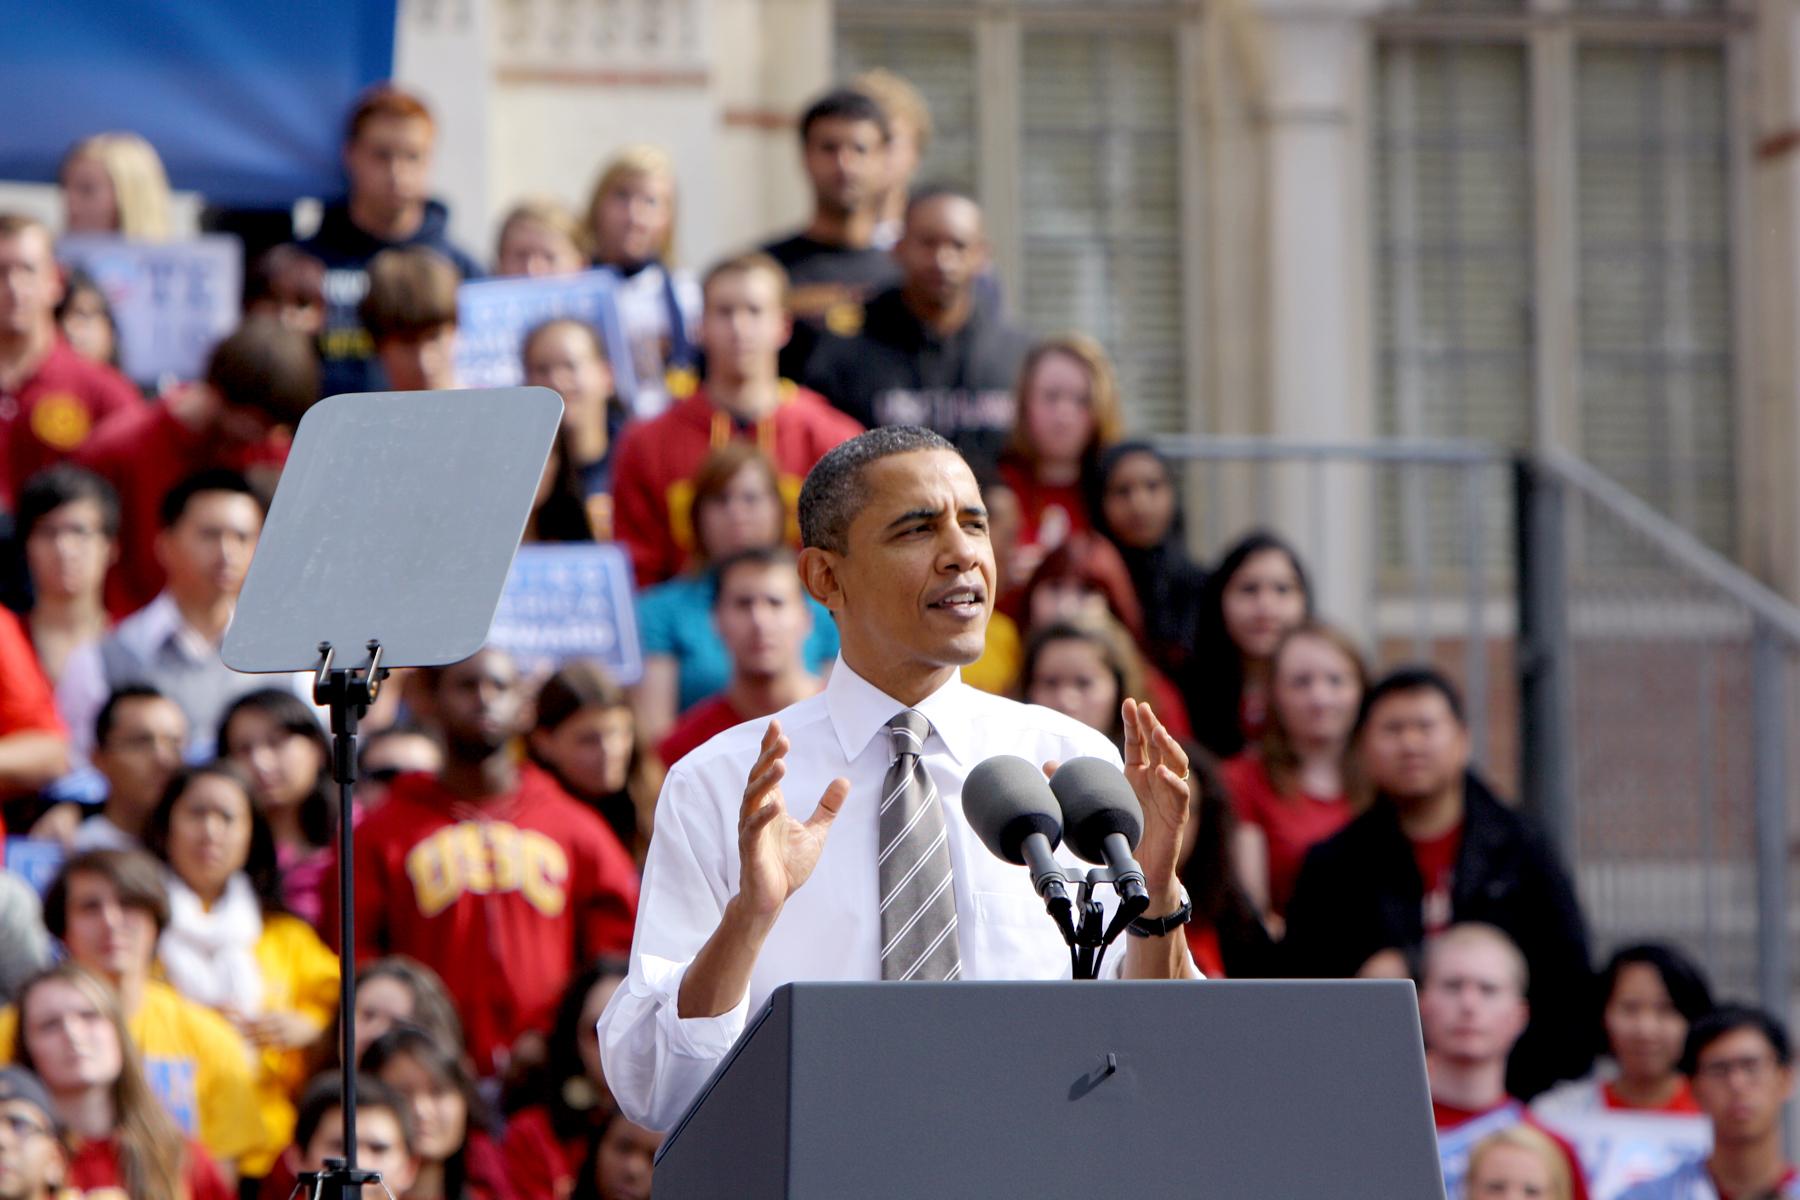 President Obama at USC 2010